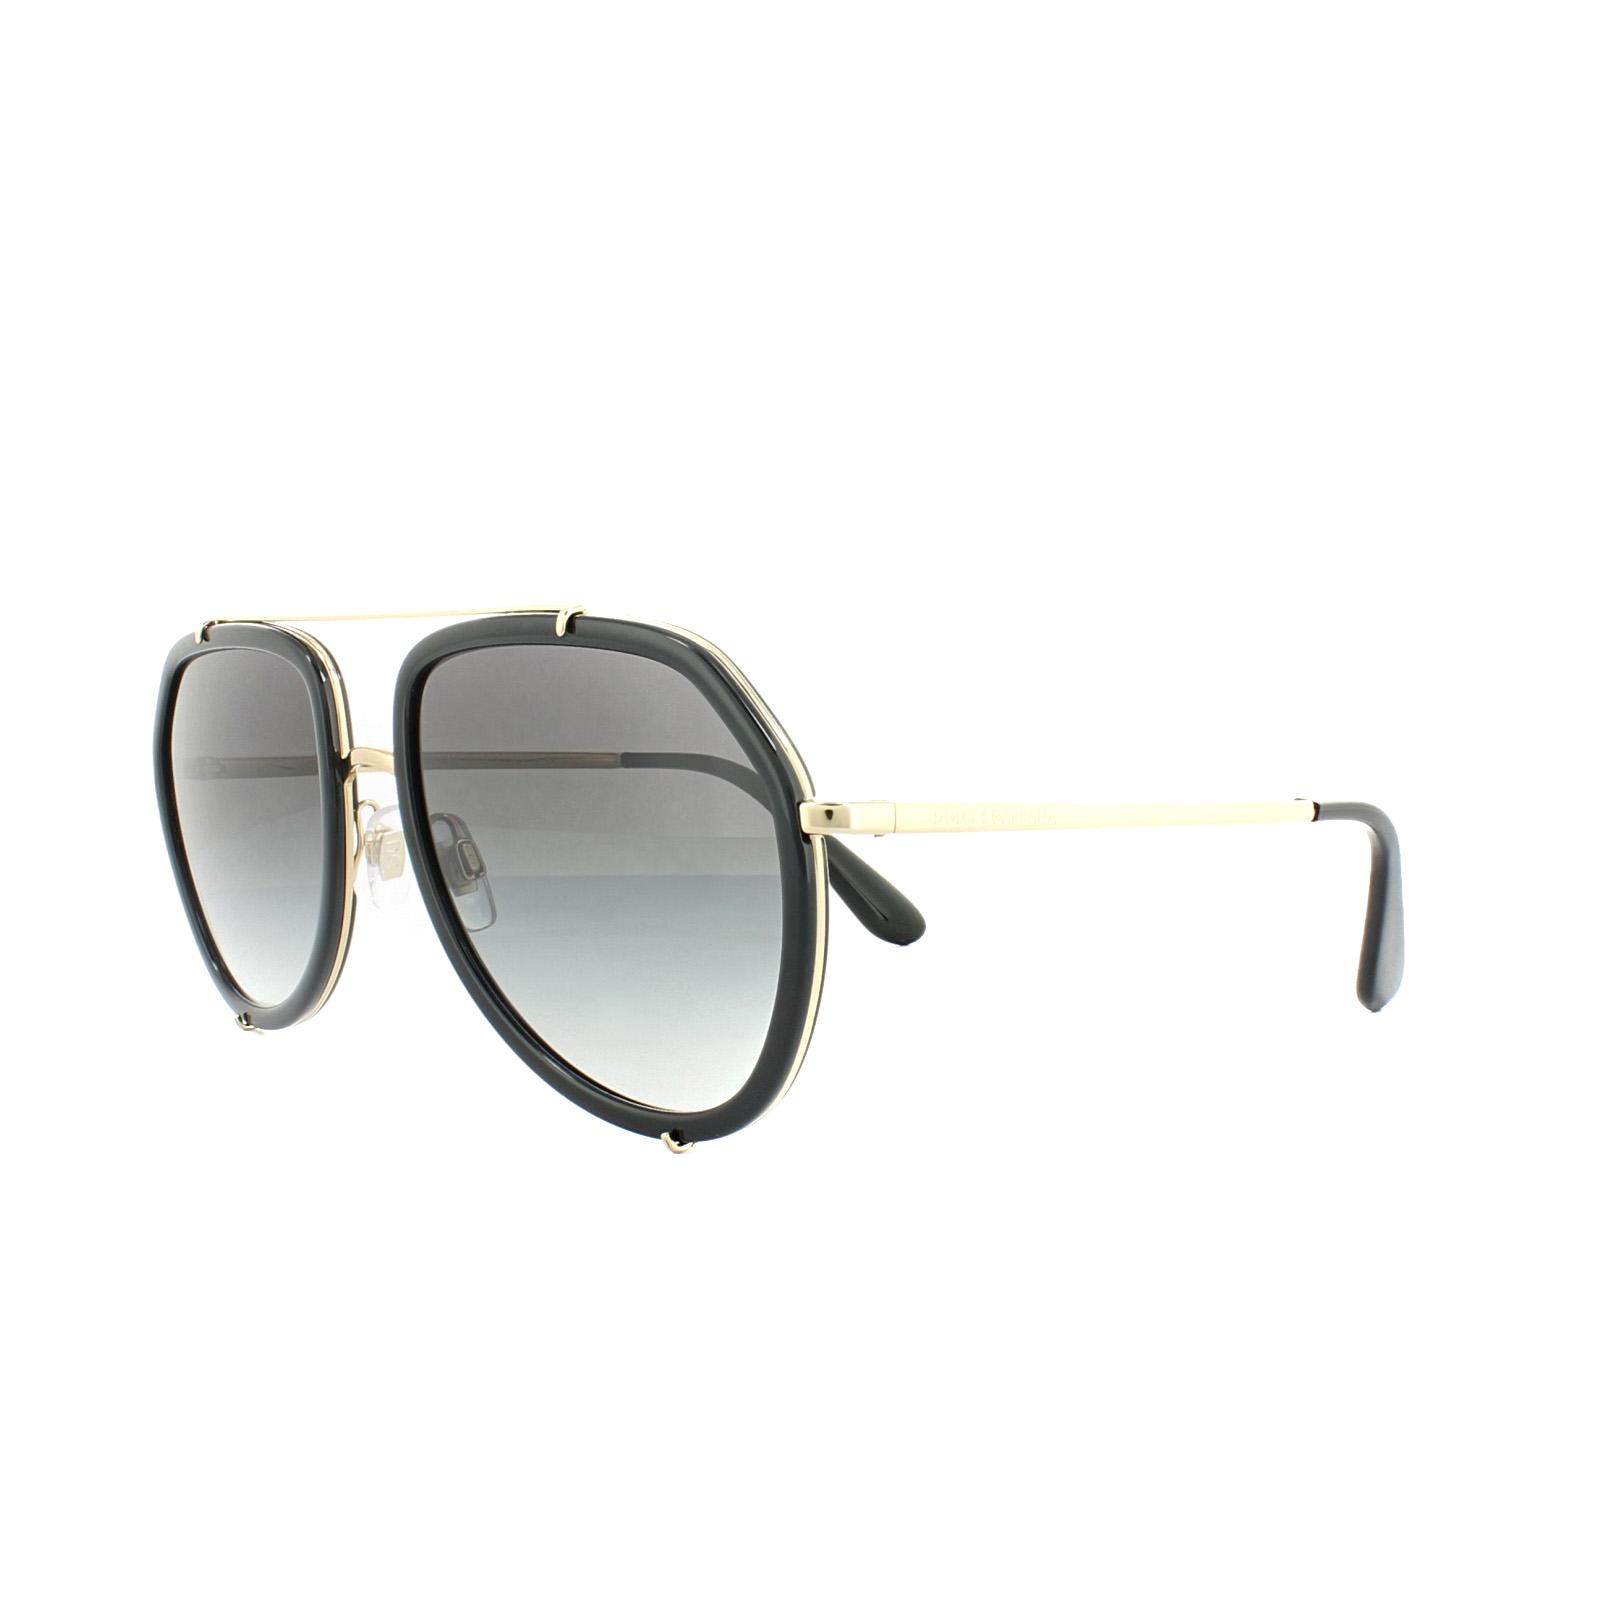 f09a538ccd Dolce and Gabbana 2161 Sunglasses Thumbnail 1 ...